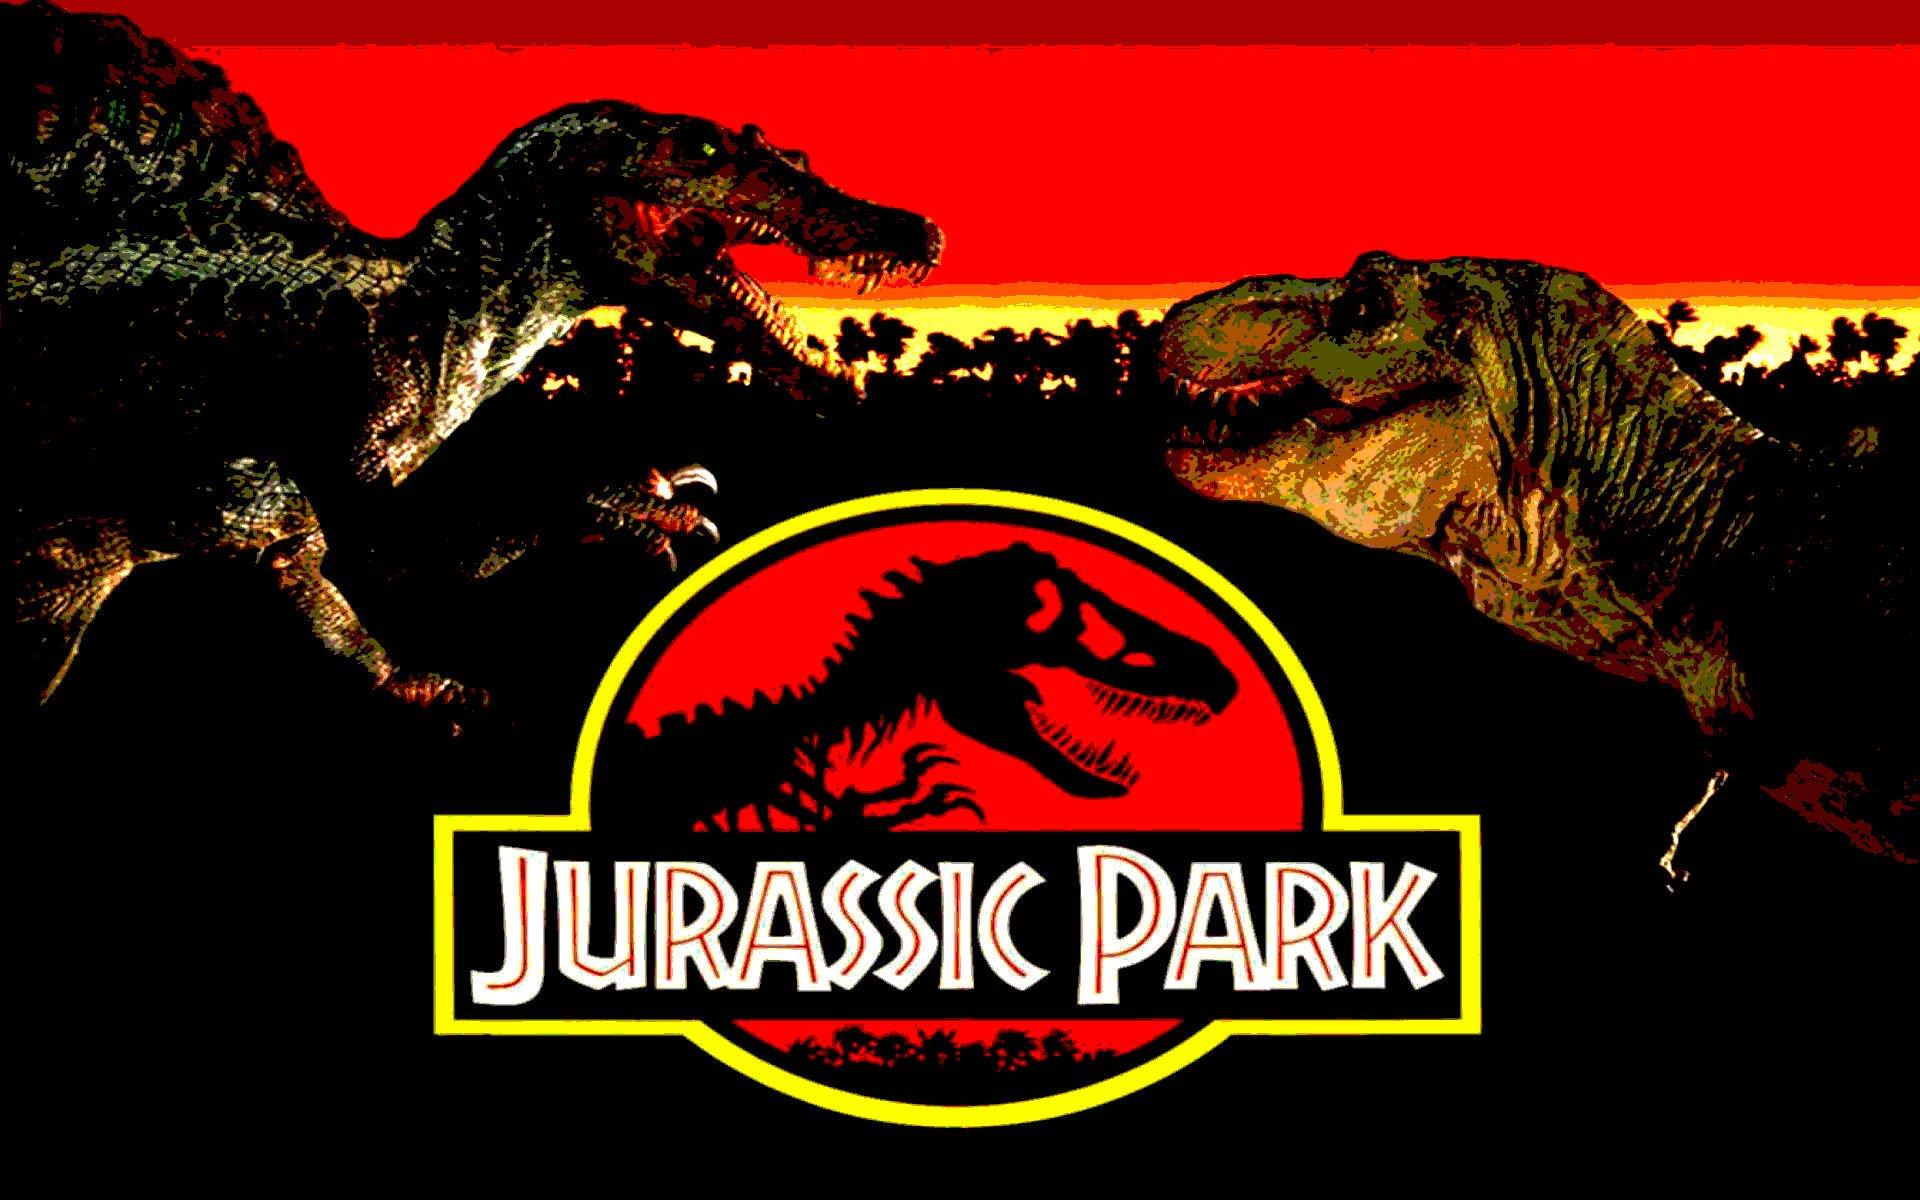 смотреть jurassic park онлайн